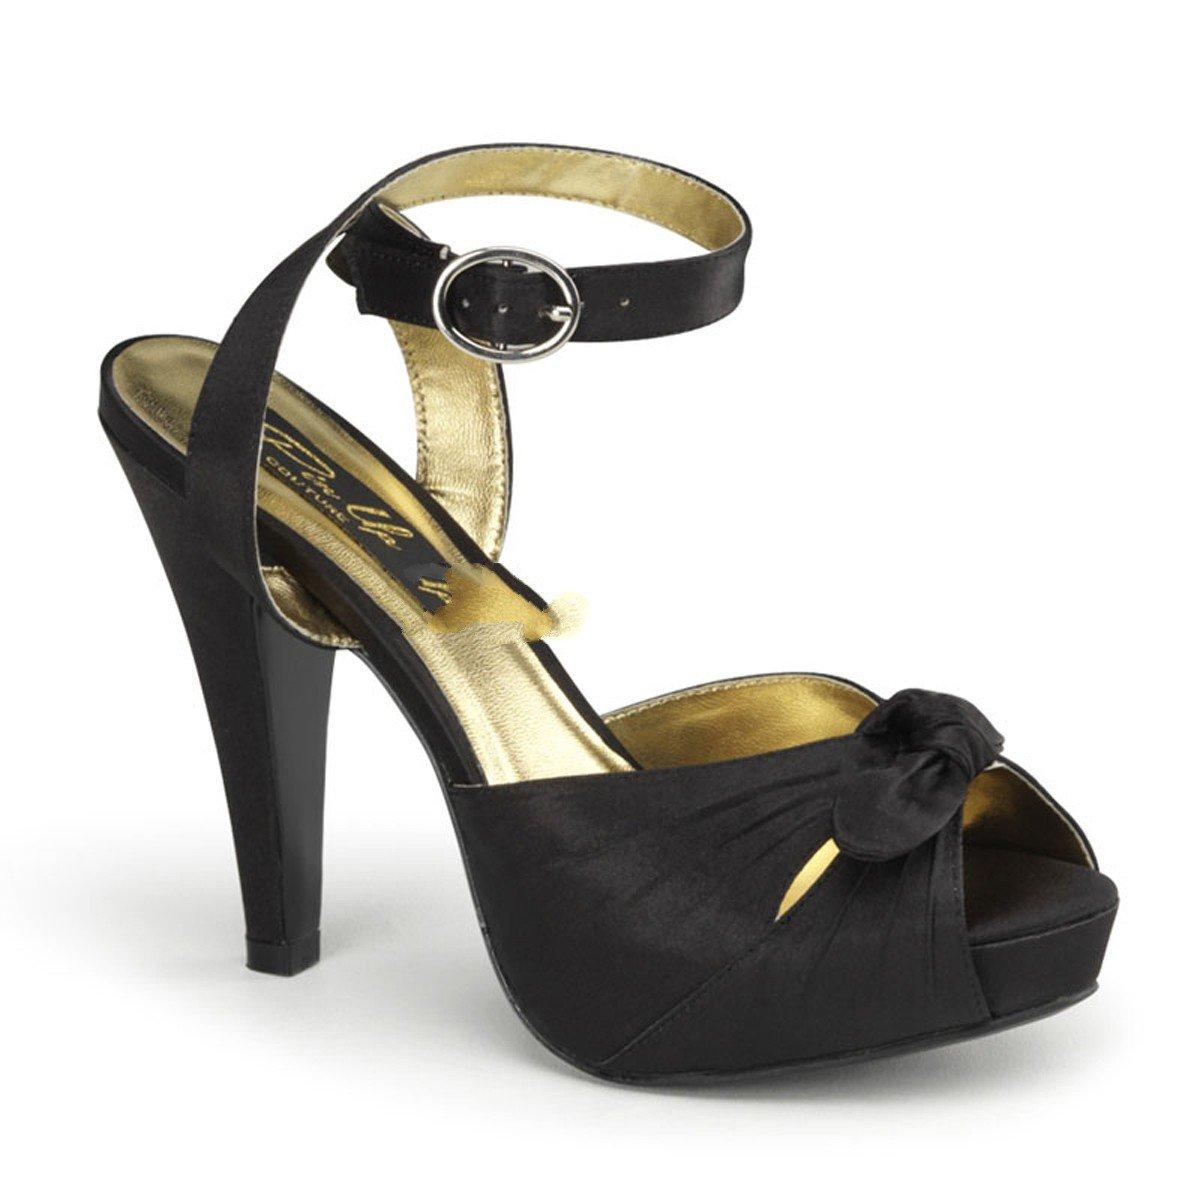 Pinup Couture Damen Bettie-04 Offene Sandalen  Mehrfarbig